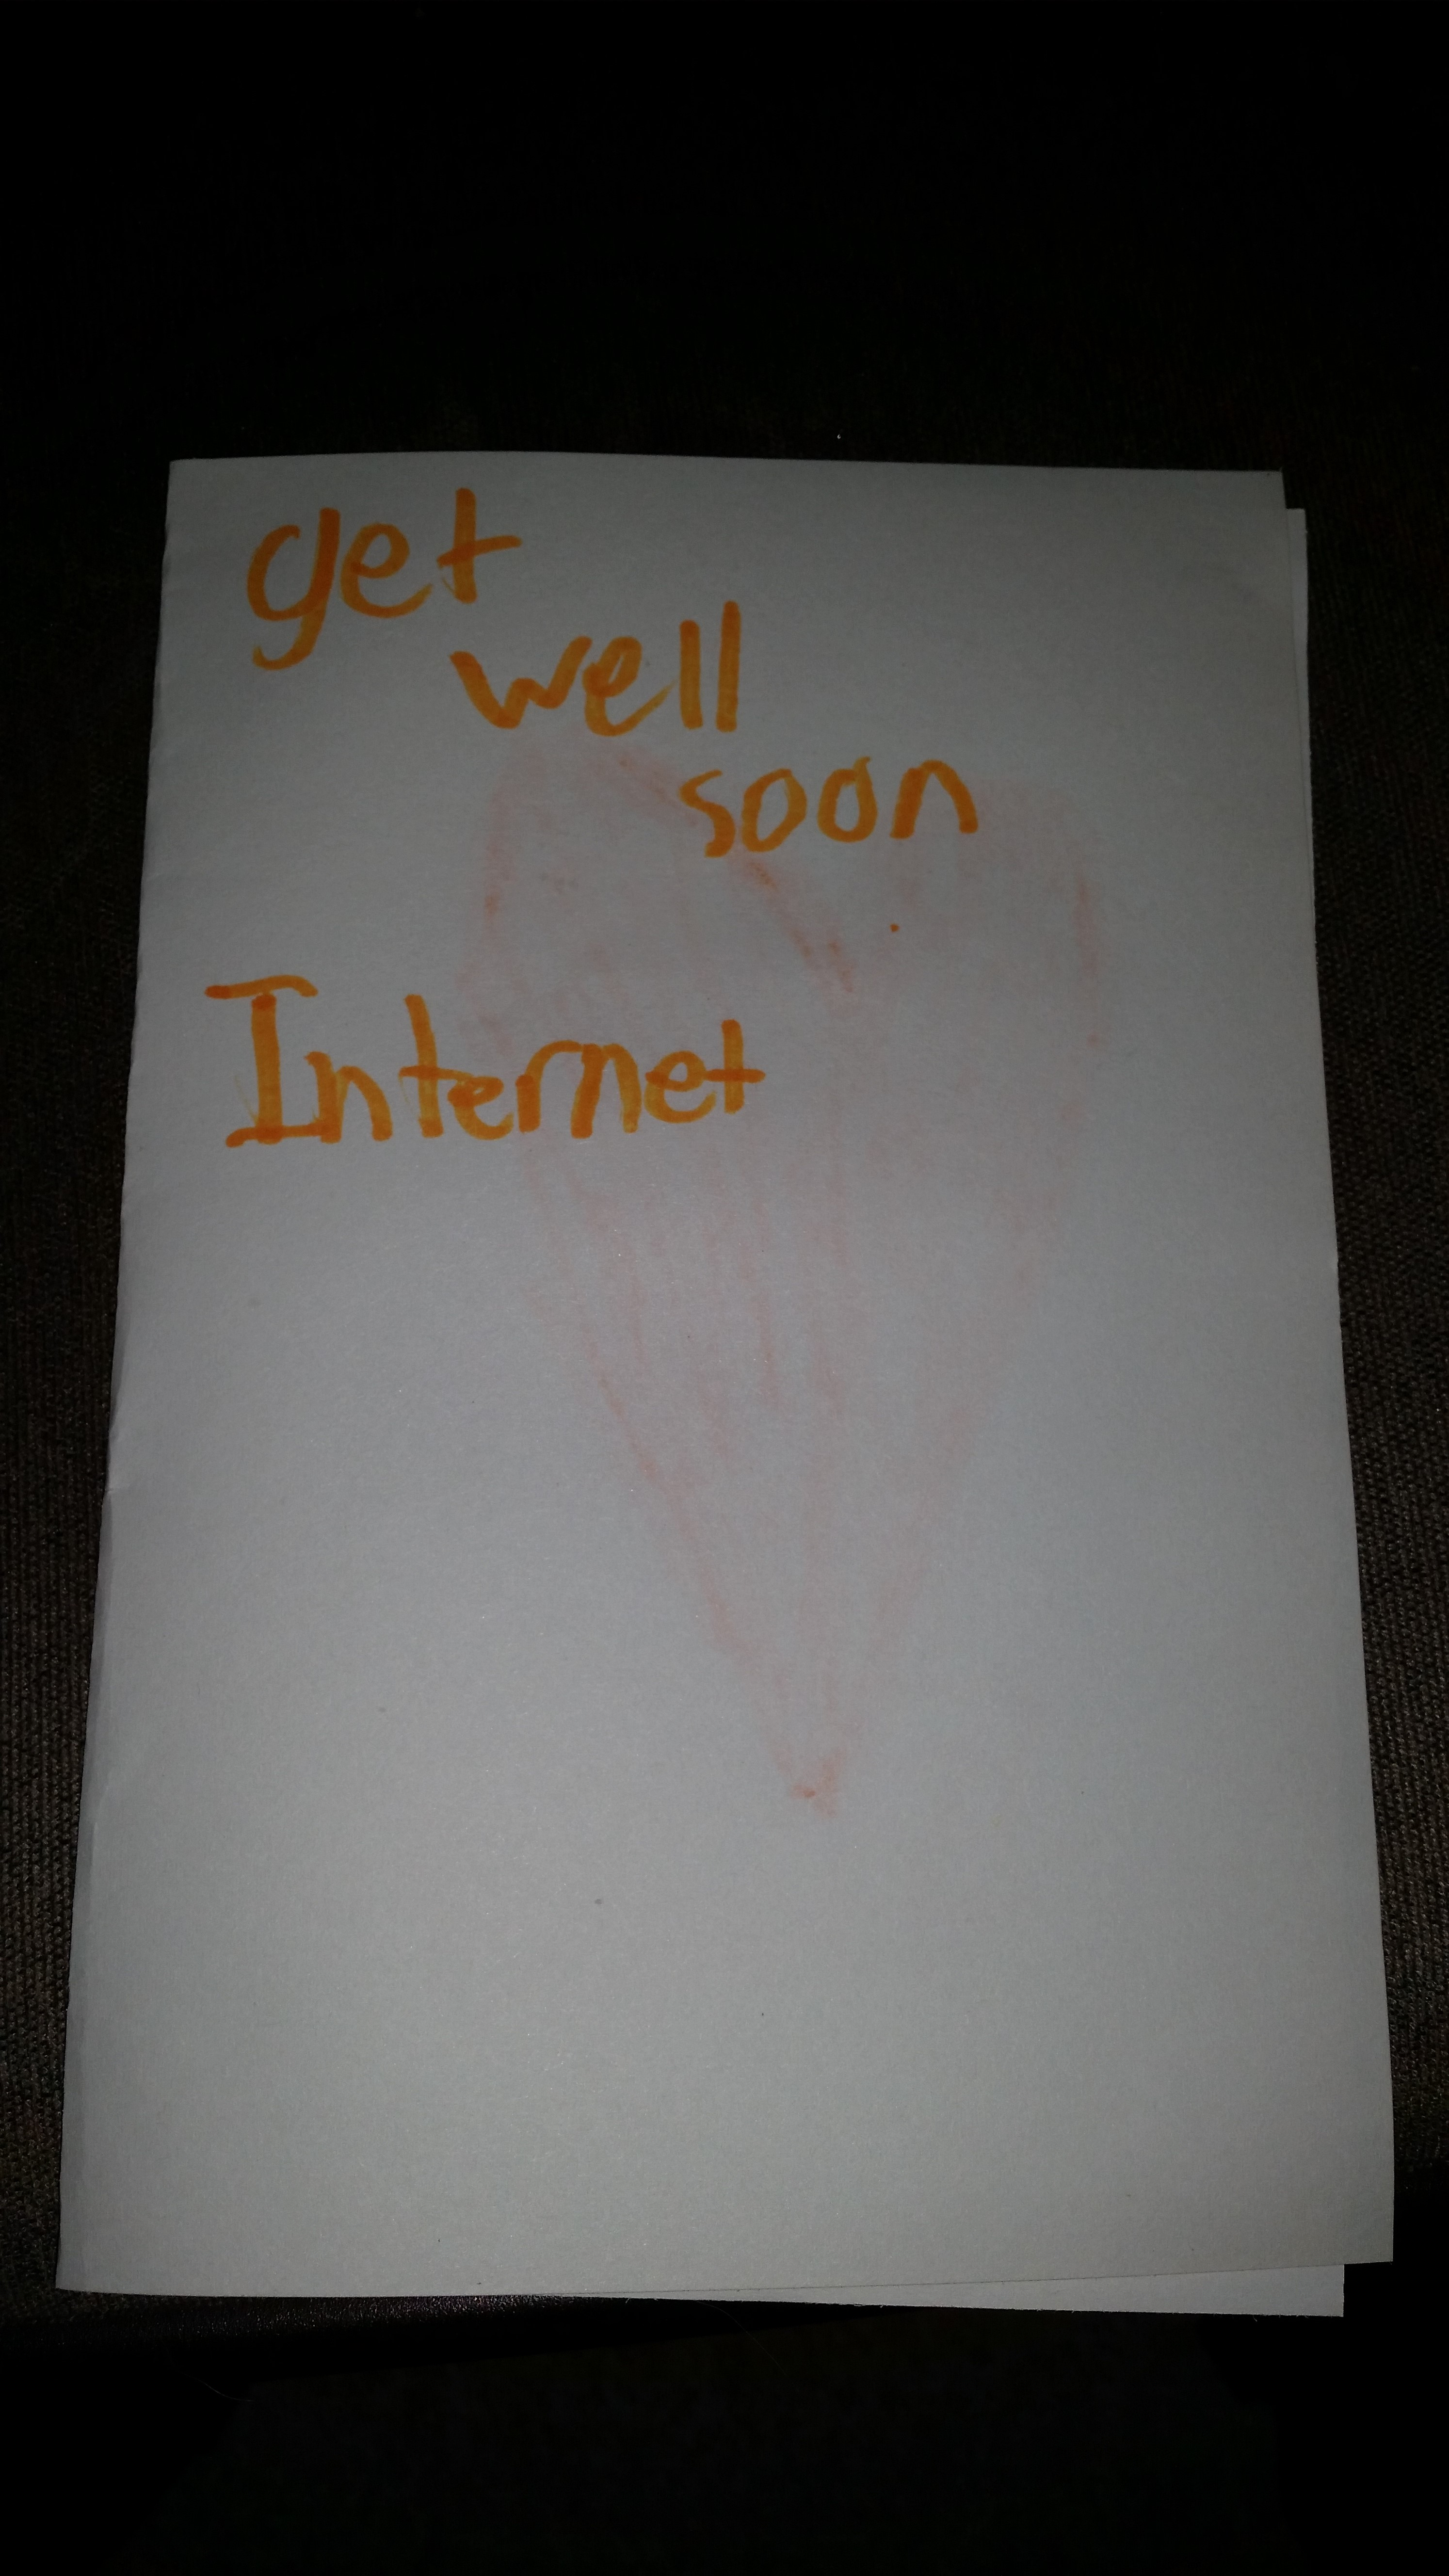 Get Well Soon  Internet